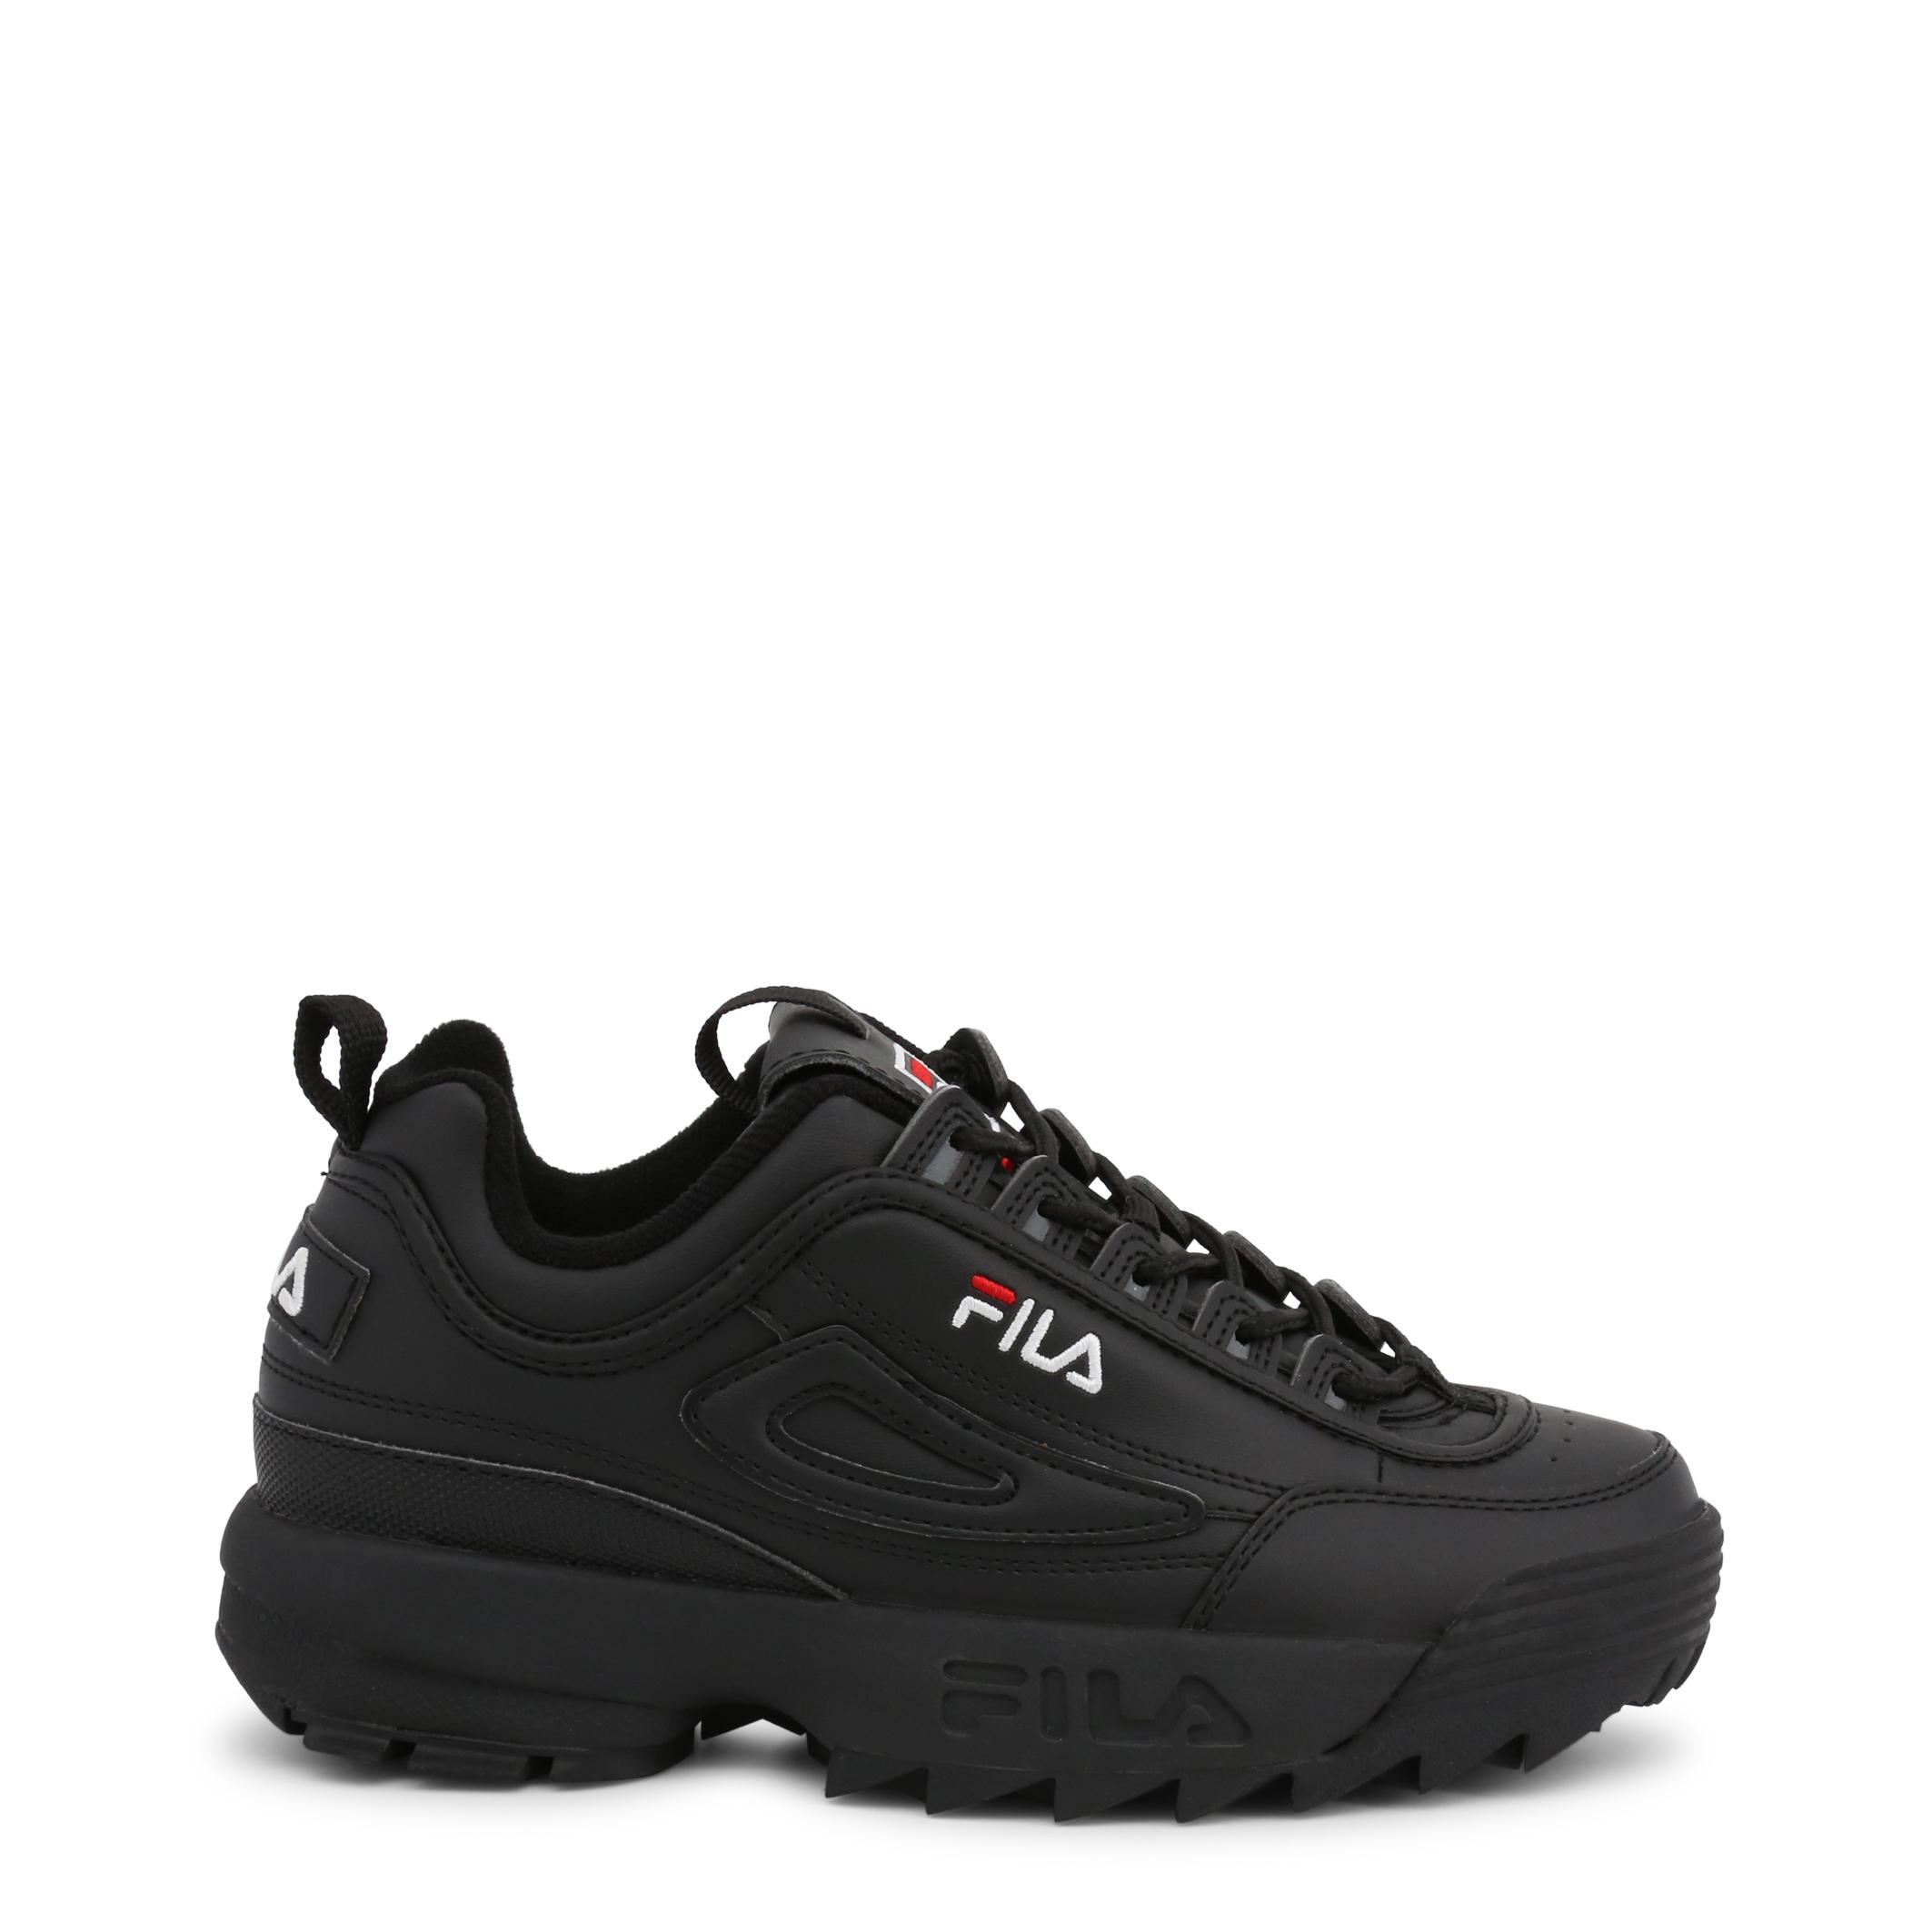 Baskets / Sneakers  Fila DISRUPTOR-LOW_1010302 black